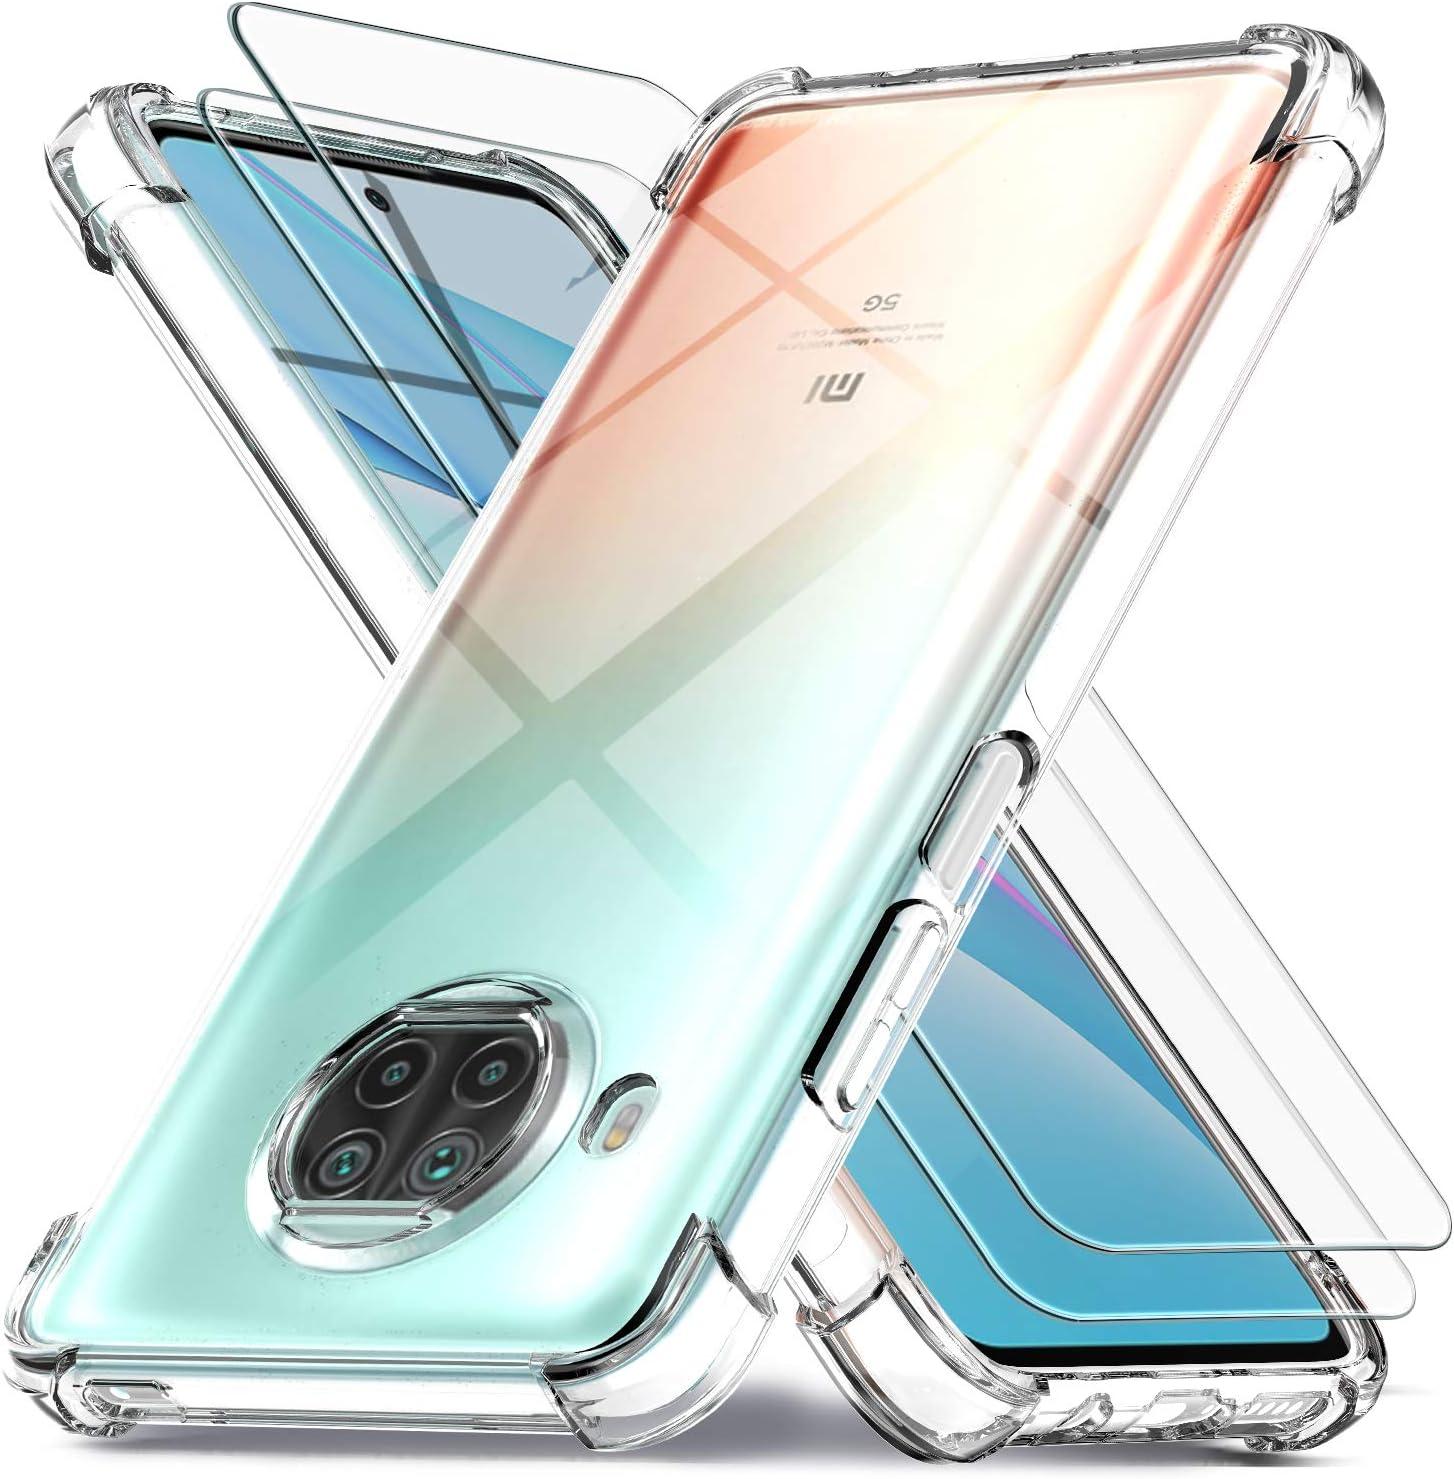 Ferilinso Funda para Xiaomi Mi 10T Lite 5G + 2 Piezas Cristal Templado Protector de Pantalla [Transparente TPU Carcasa] [10X Anti-Amarilleo] [Anti-Choque] [Anti-arañazos] [9H Dureza]